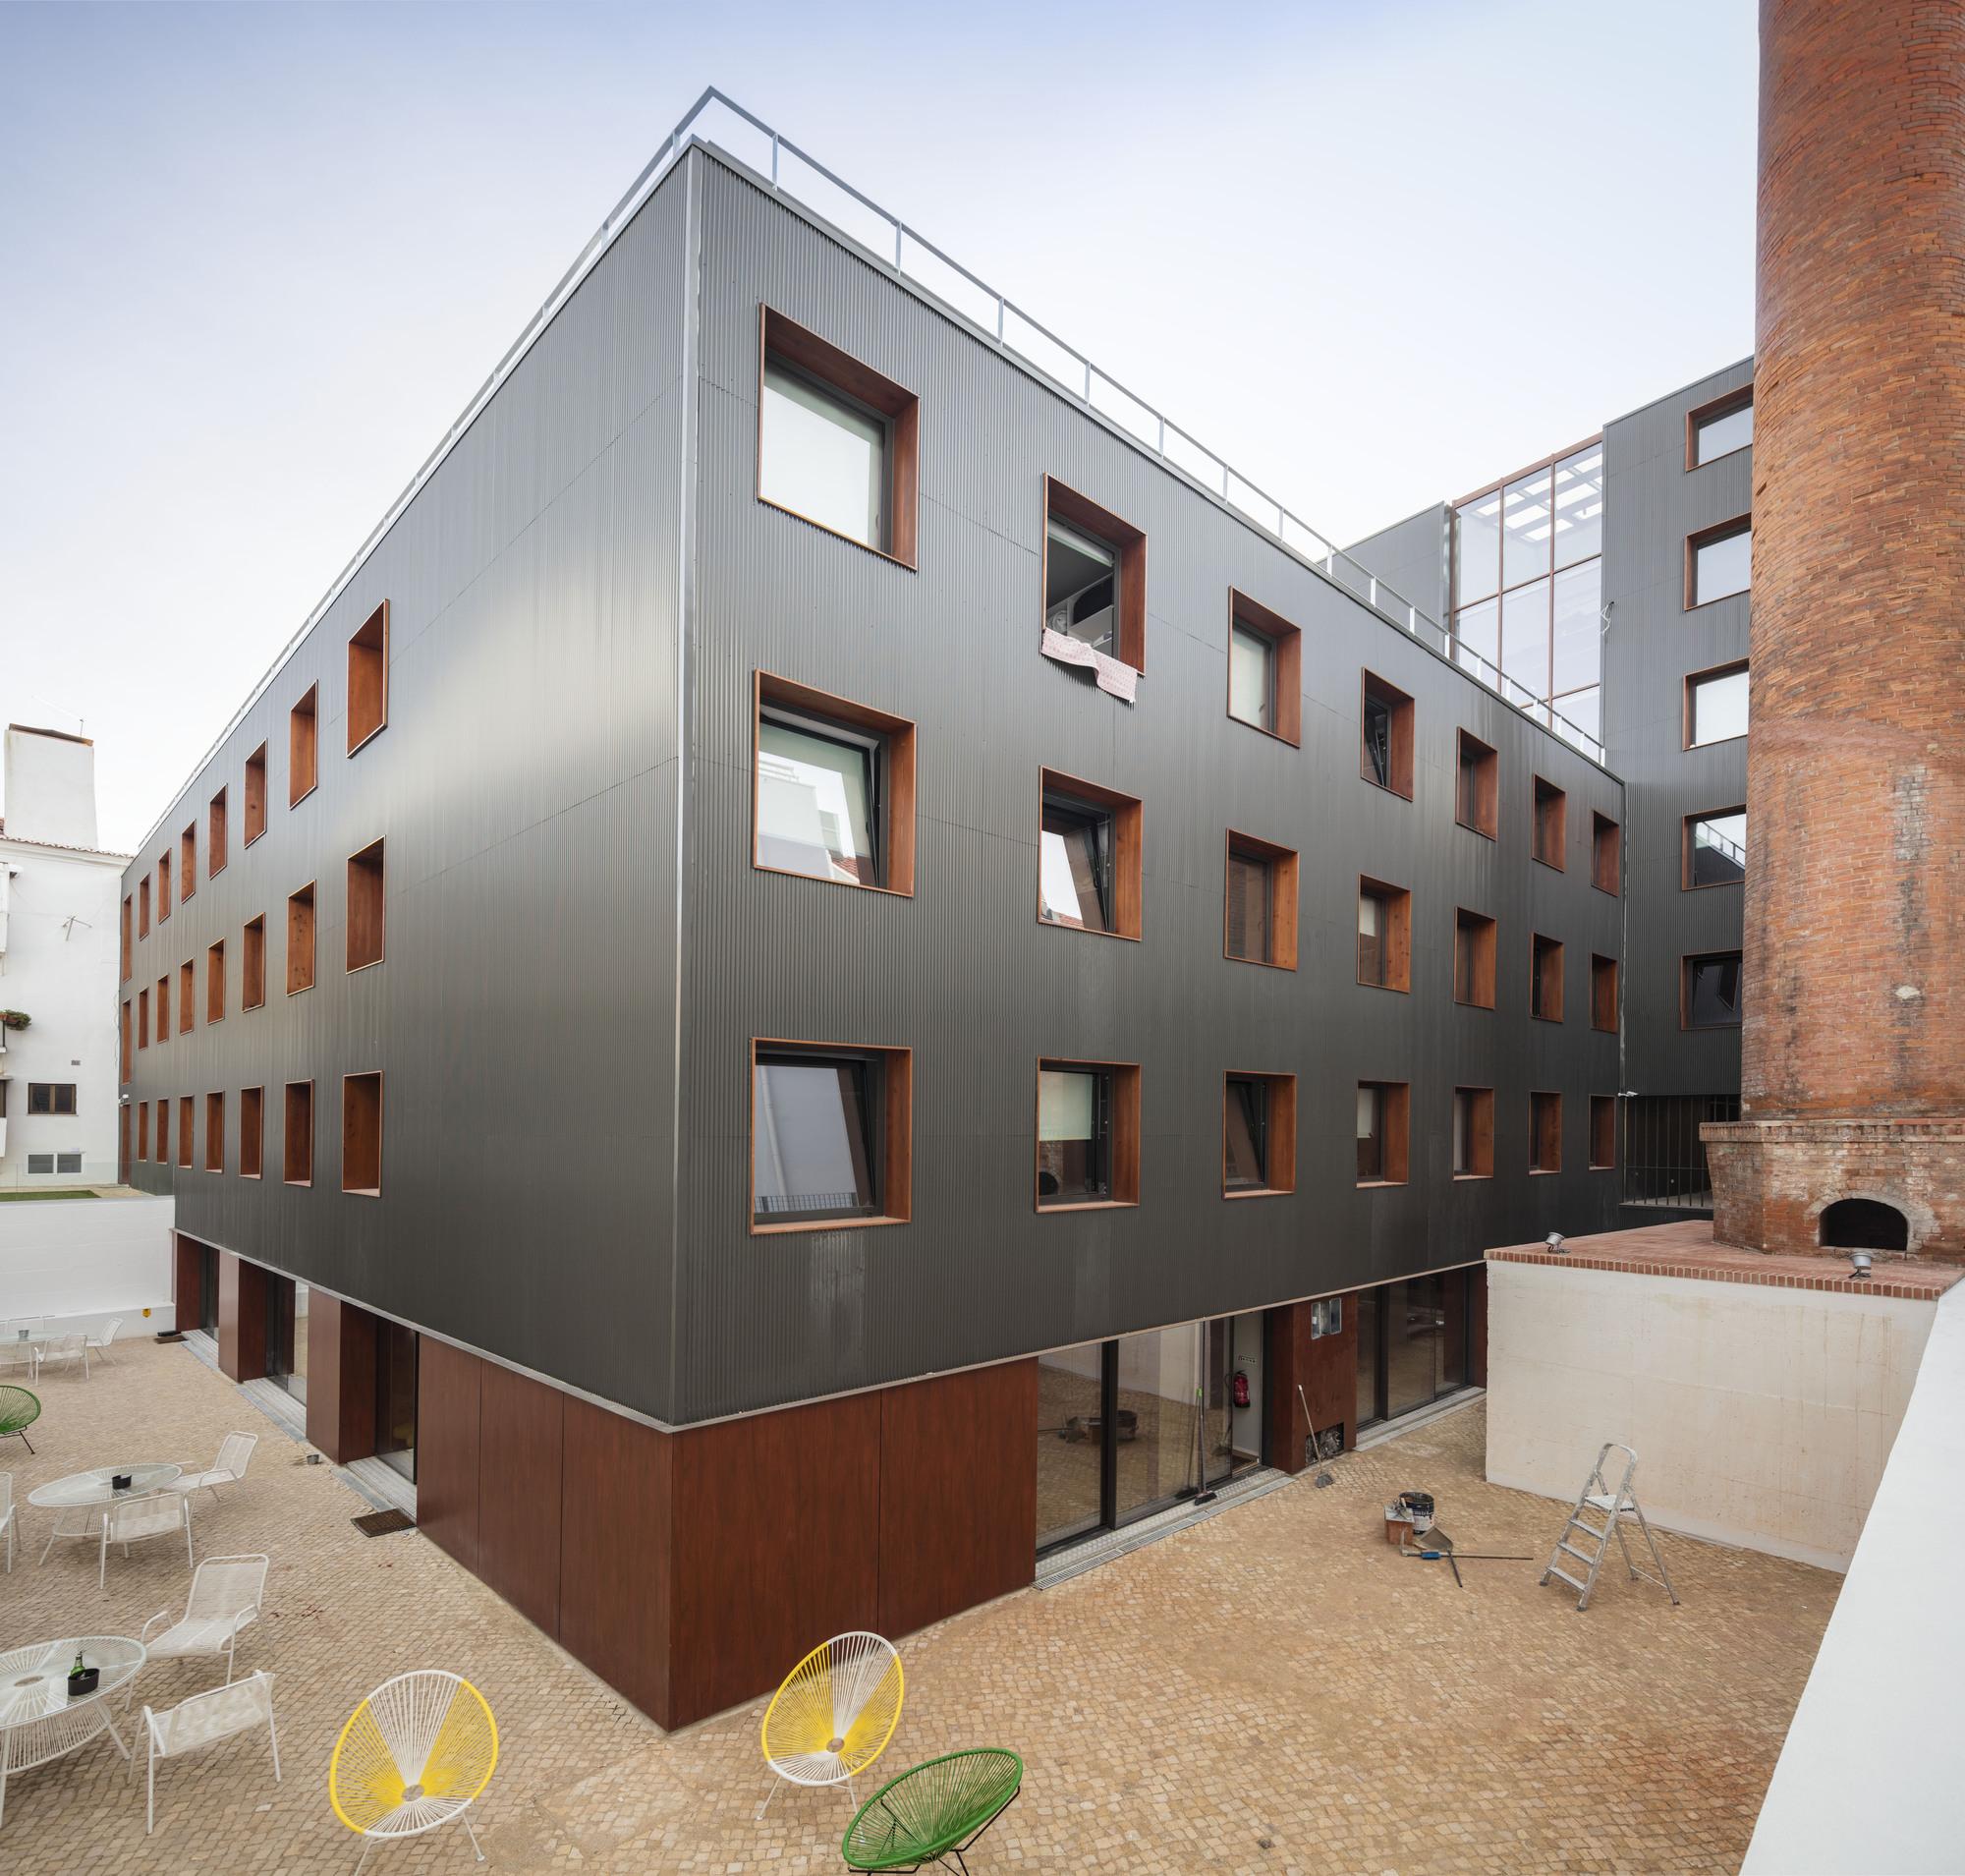 Student Apartments: Gallery Of Doorm Student Housing / Luís Rebelo De Andrade